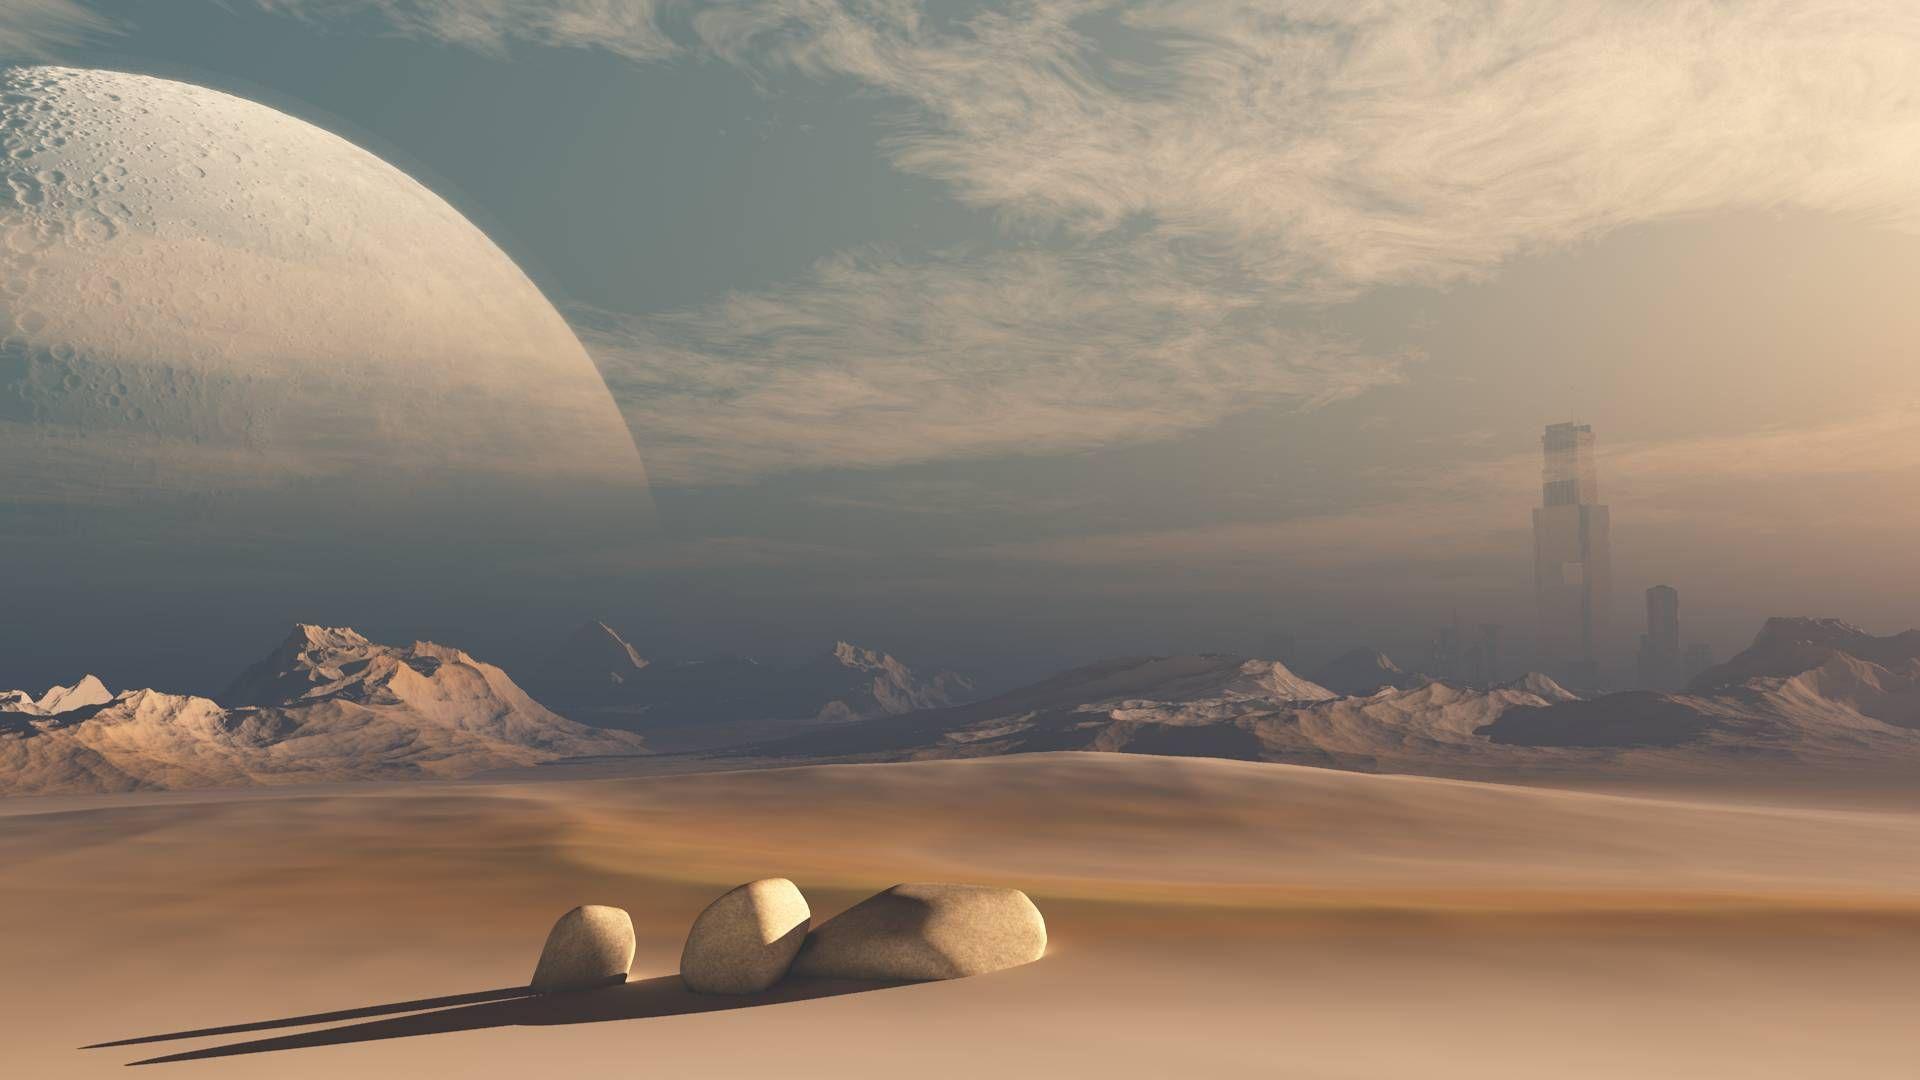 #mars #moon #space #desert #sciencefiction